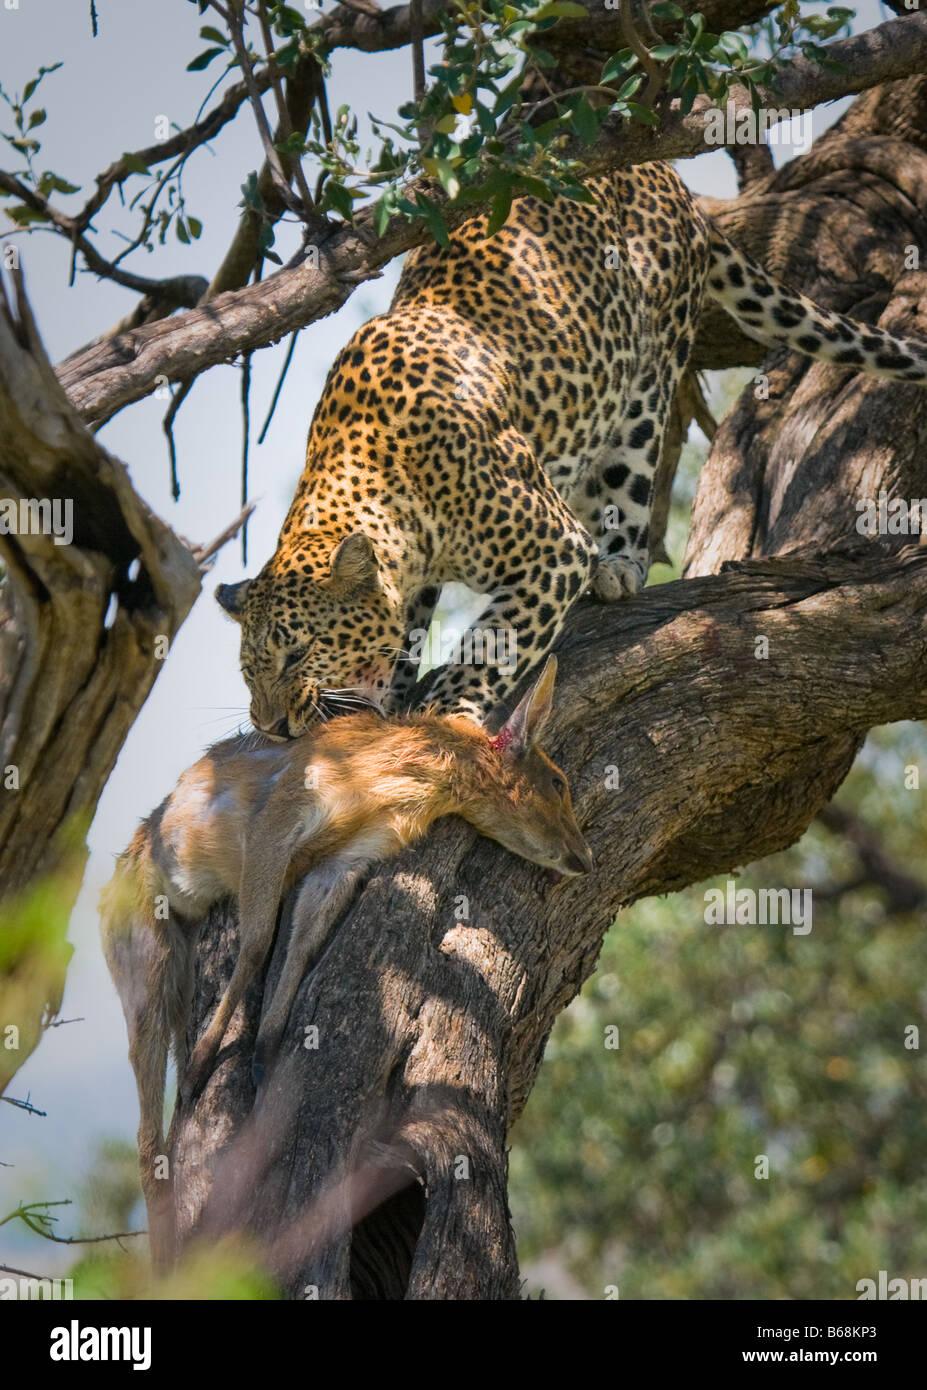 leopard eating impala masai mara kenya - Stock Image